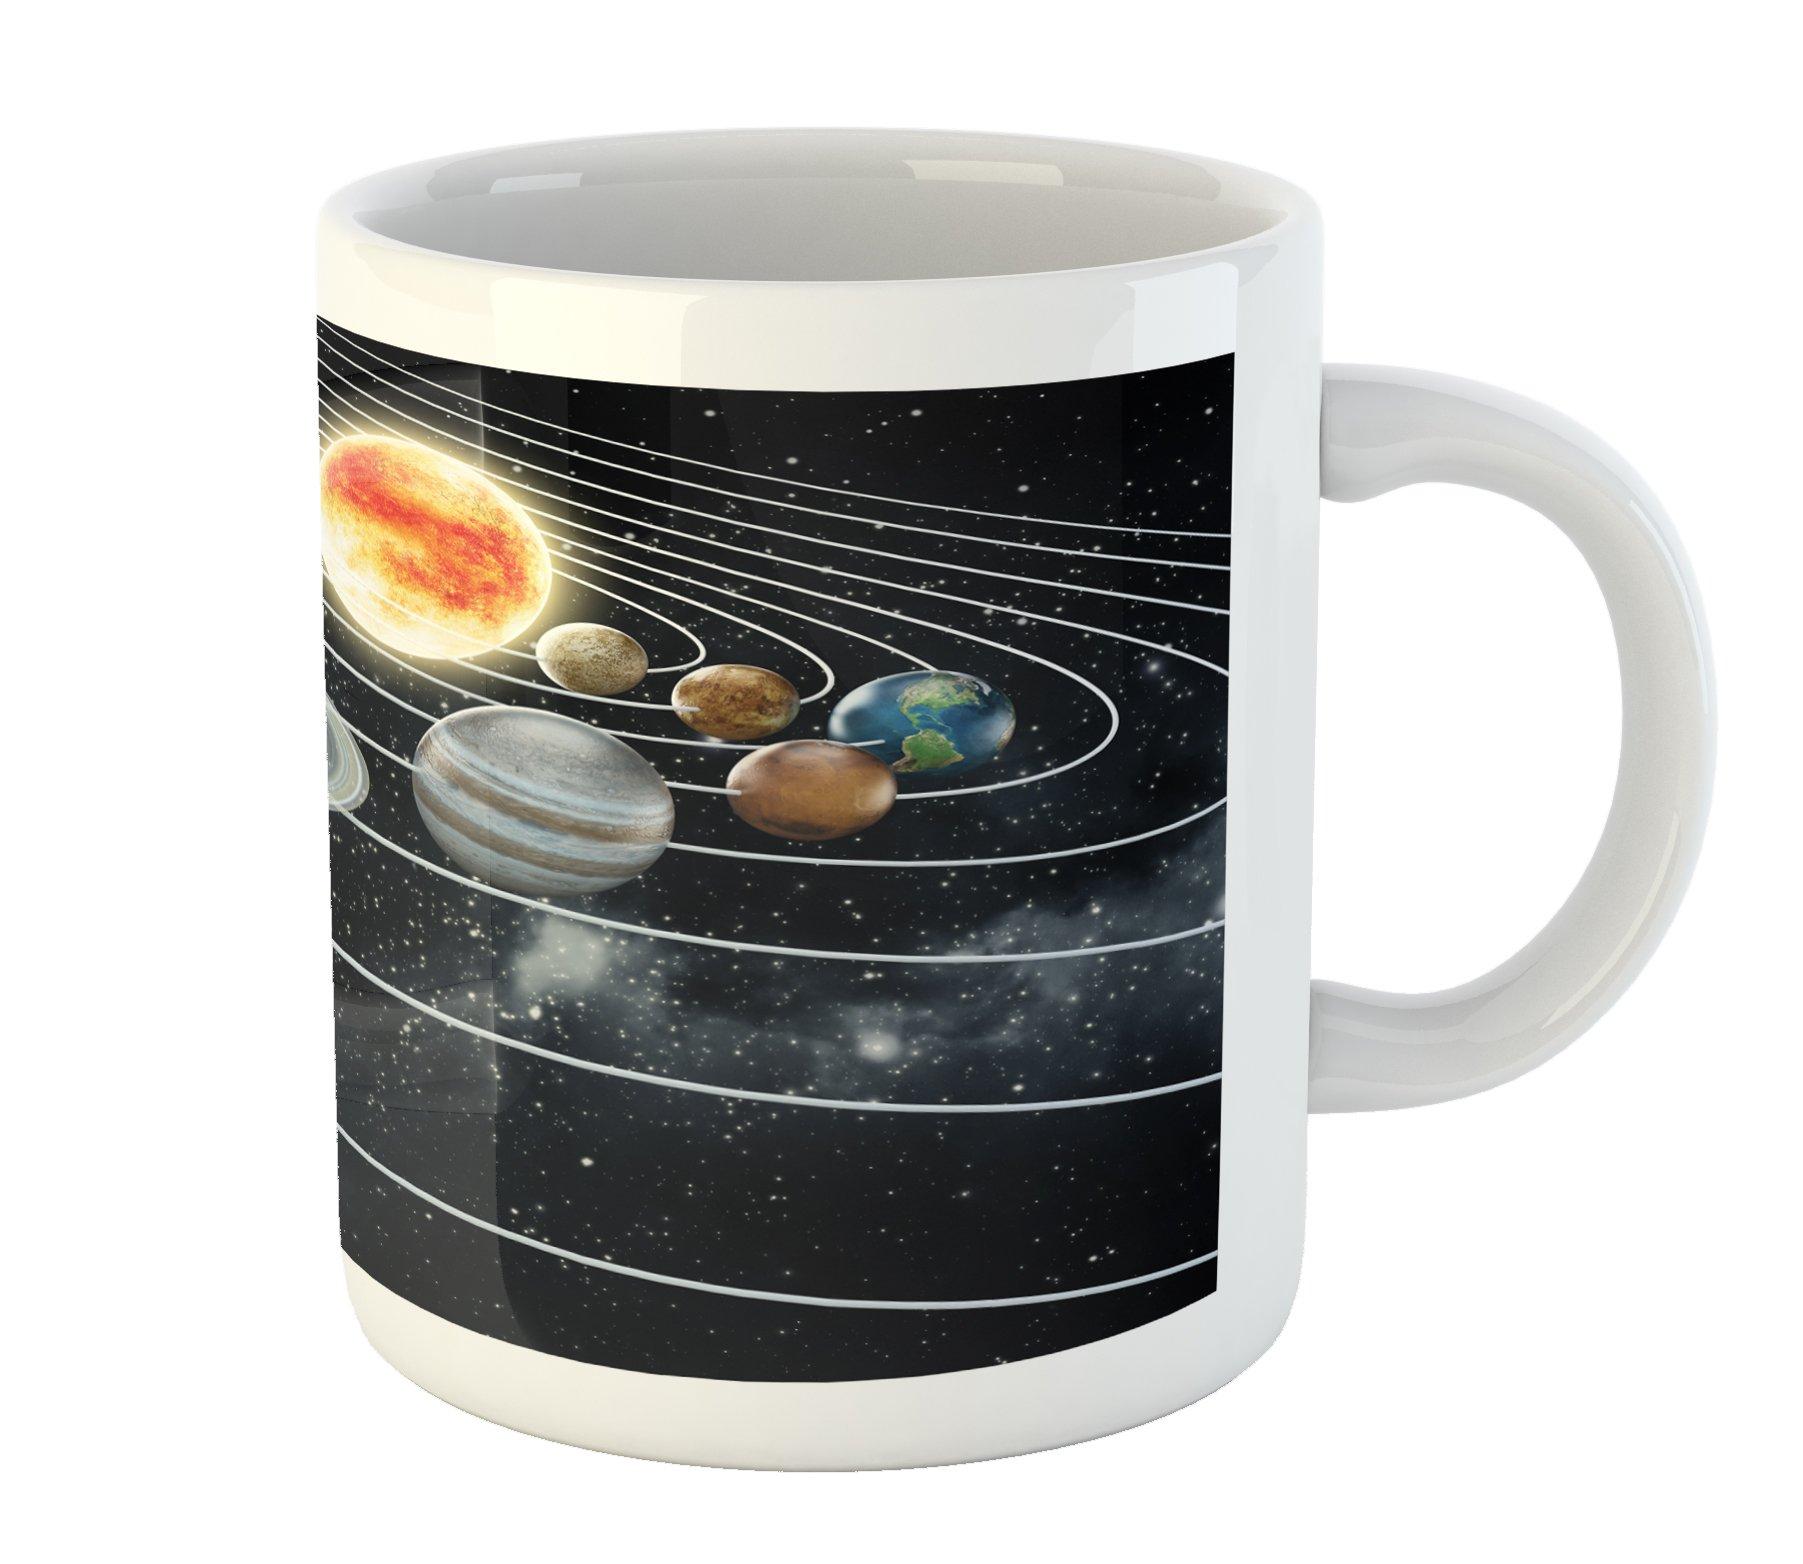 Ambesonne Galaxy Mug, Solar System All Eight Planets and The Sun Pluto Jupiter Mars Venus Science Fiction, Printed Ceramic Coffee Mug Water Tea Drinks Cup, Black Grey